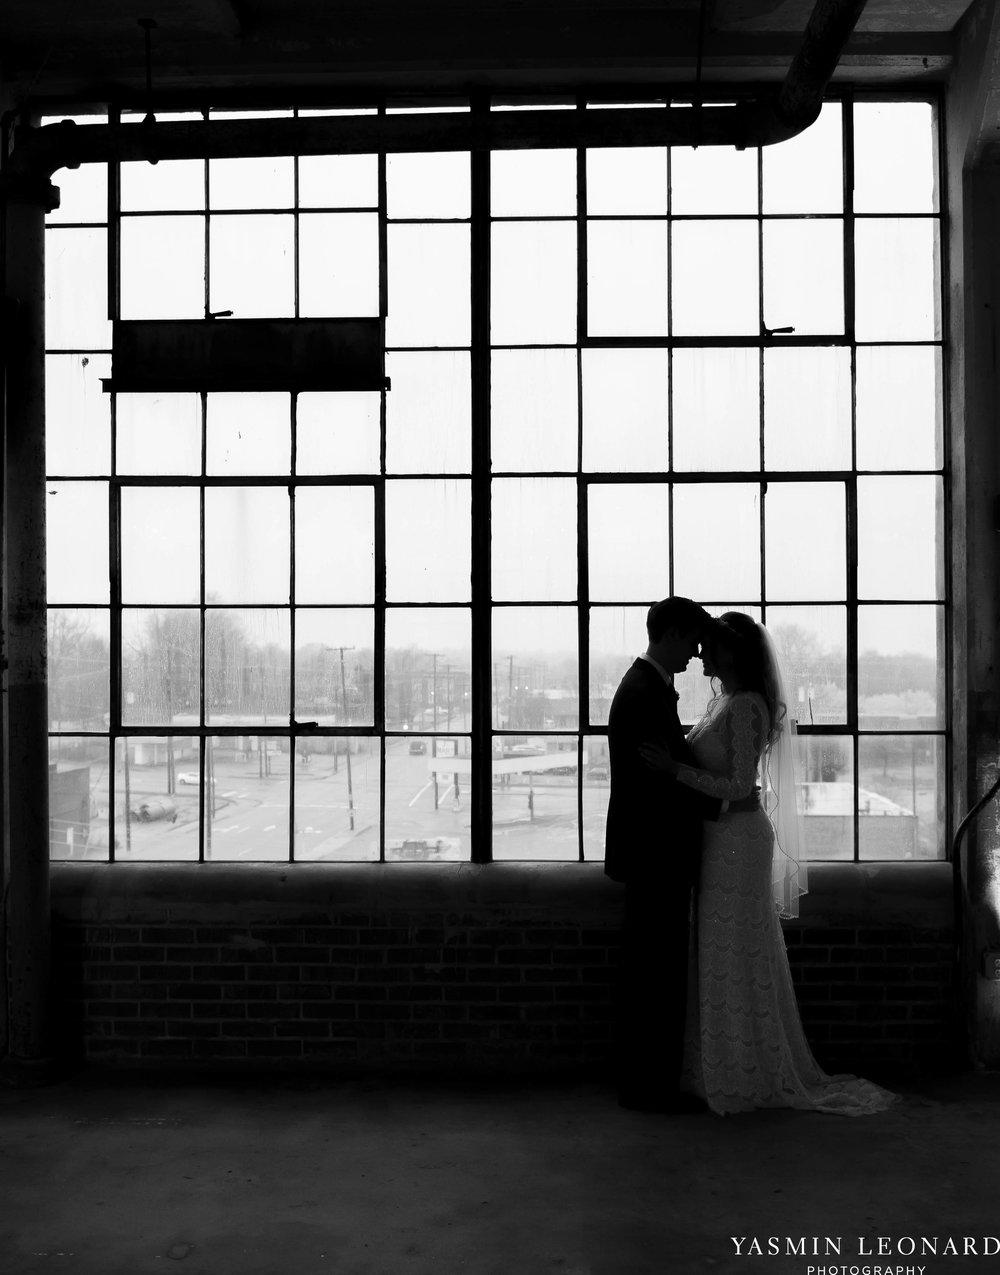 The Lofts at Union Square - Unions - High Point Weddings - NC Weddings - NC Wedding Photographer - Yasmin Leonard Photography - Just Priceless - Green Pink and Gold Wedding - Elegant Wedding-36.jpg